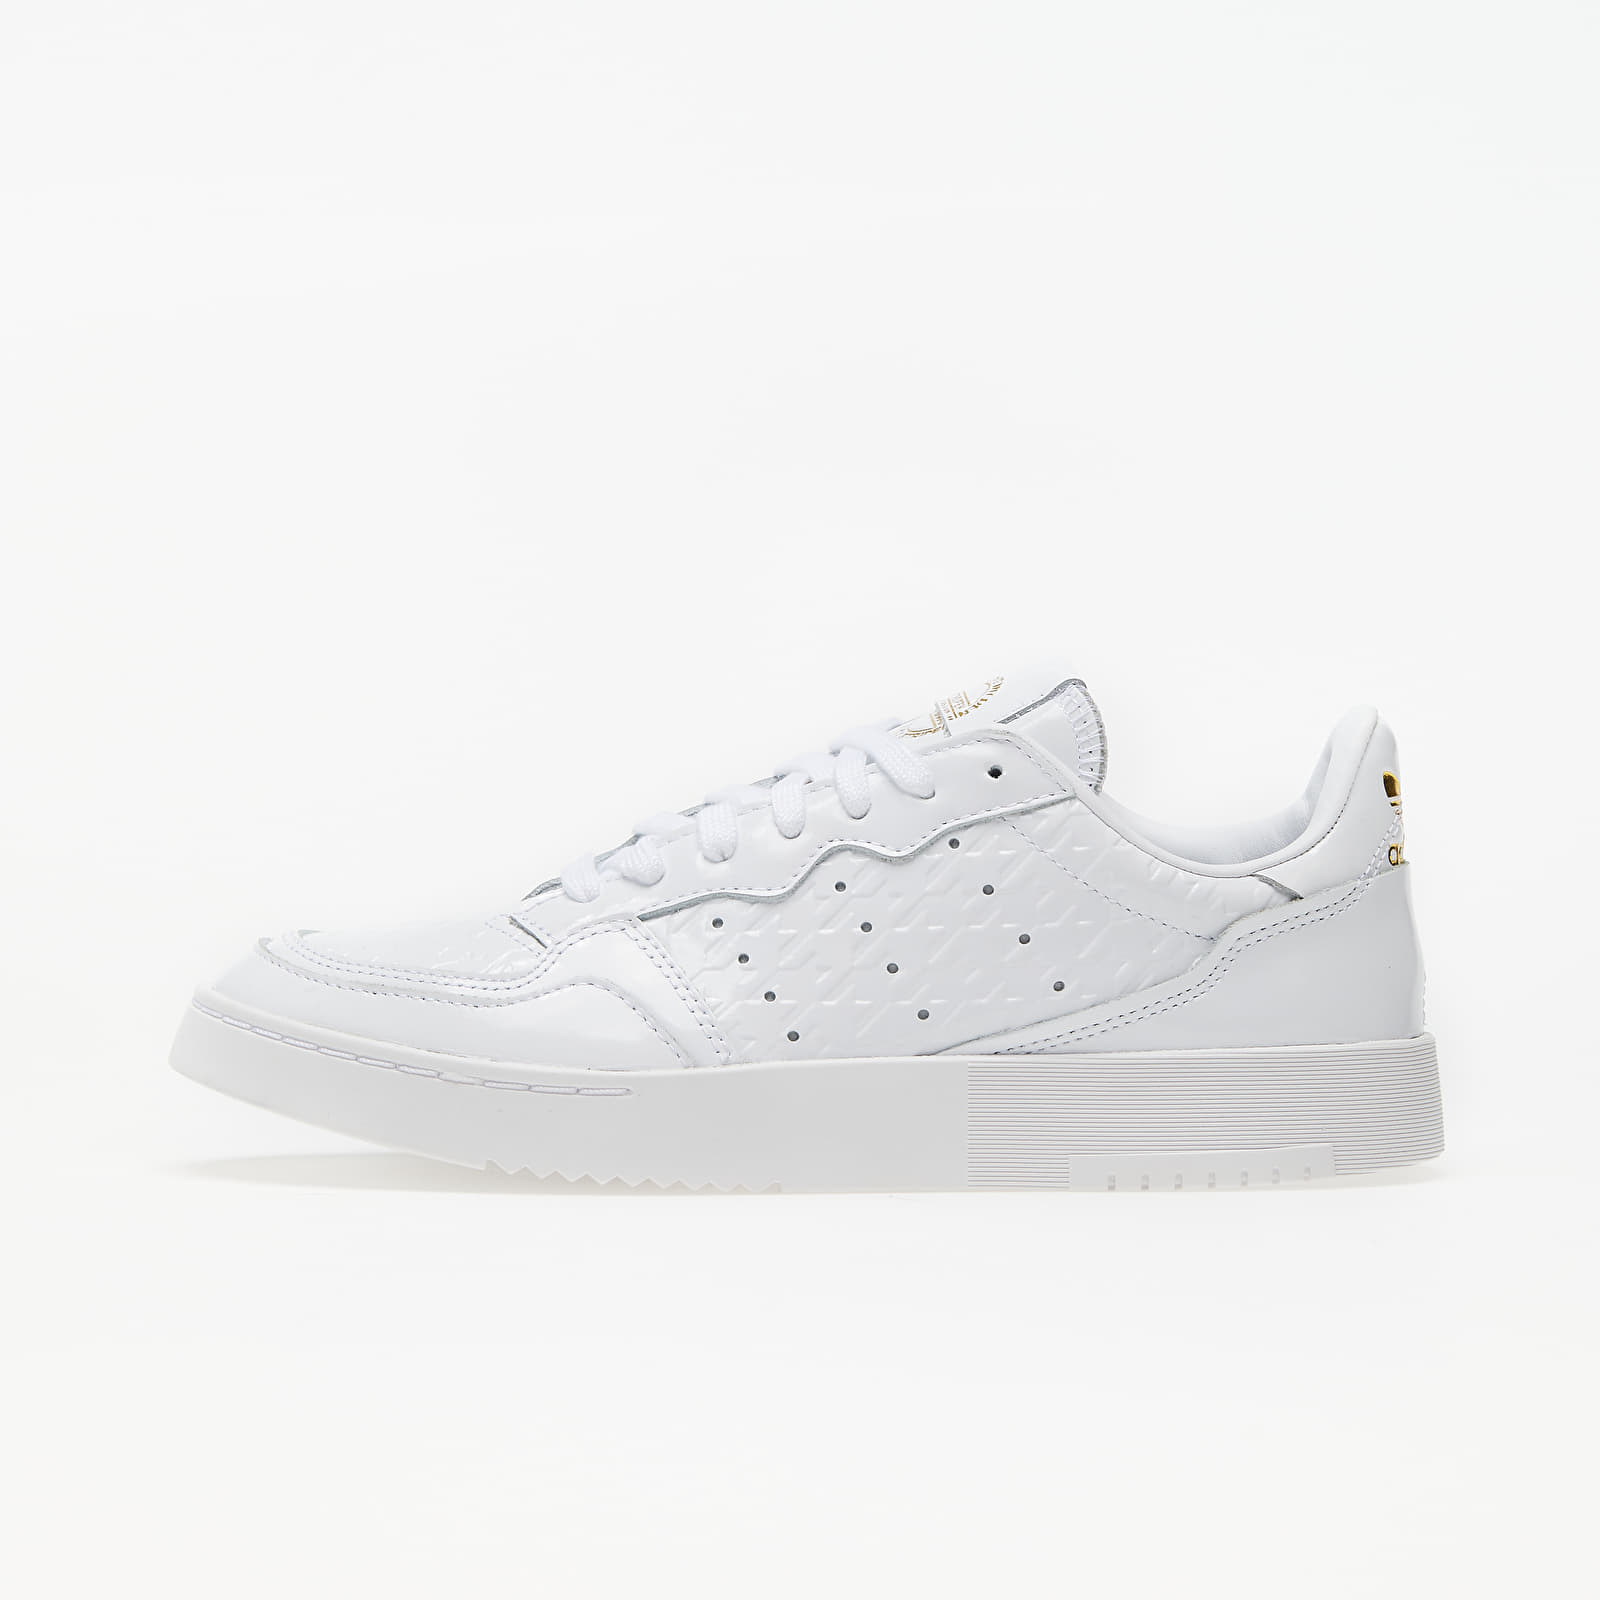 Chaussures et baskets femme adidas Supercourt W Ftw White/ Ftw White/ Gold Metalic